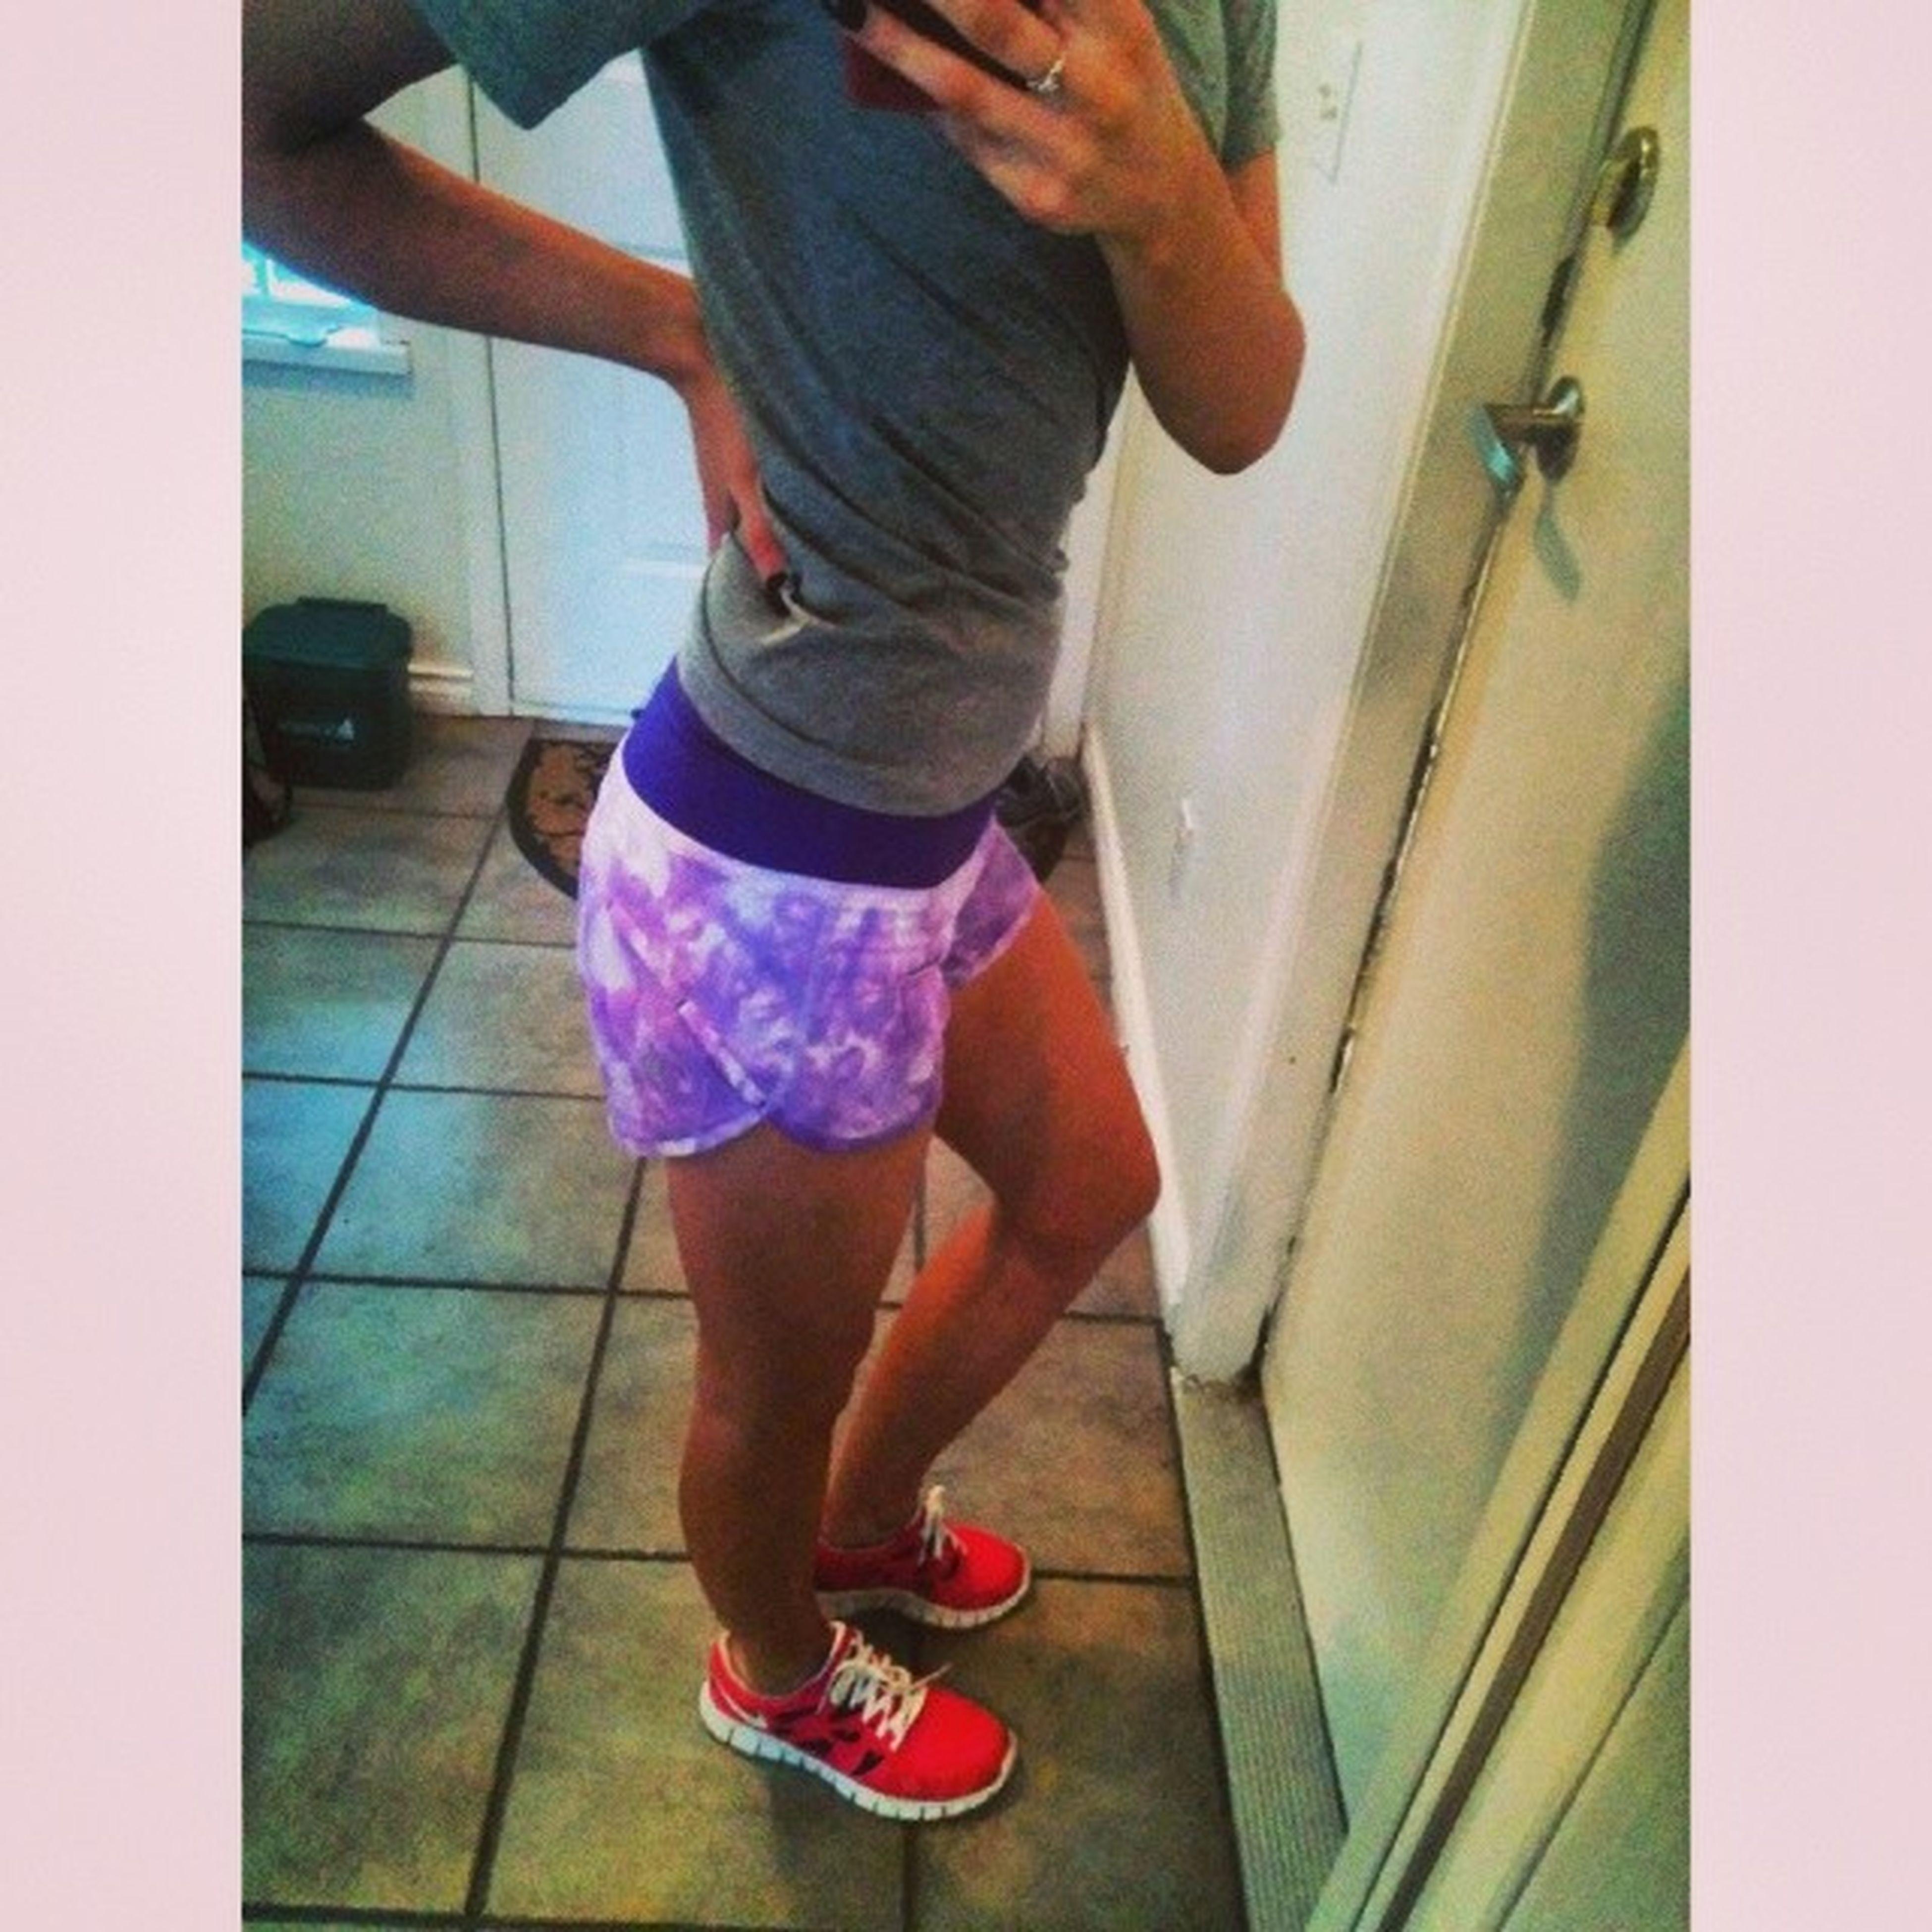 Gotta love it when you get new gym gear! NikeFreeRuns Lululemon Sickshorts LoveEm favecolourssummerwear???